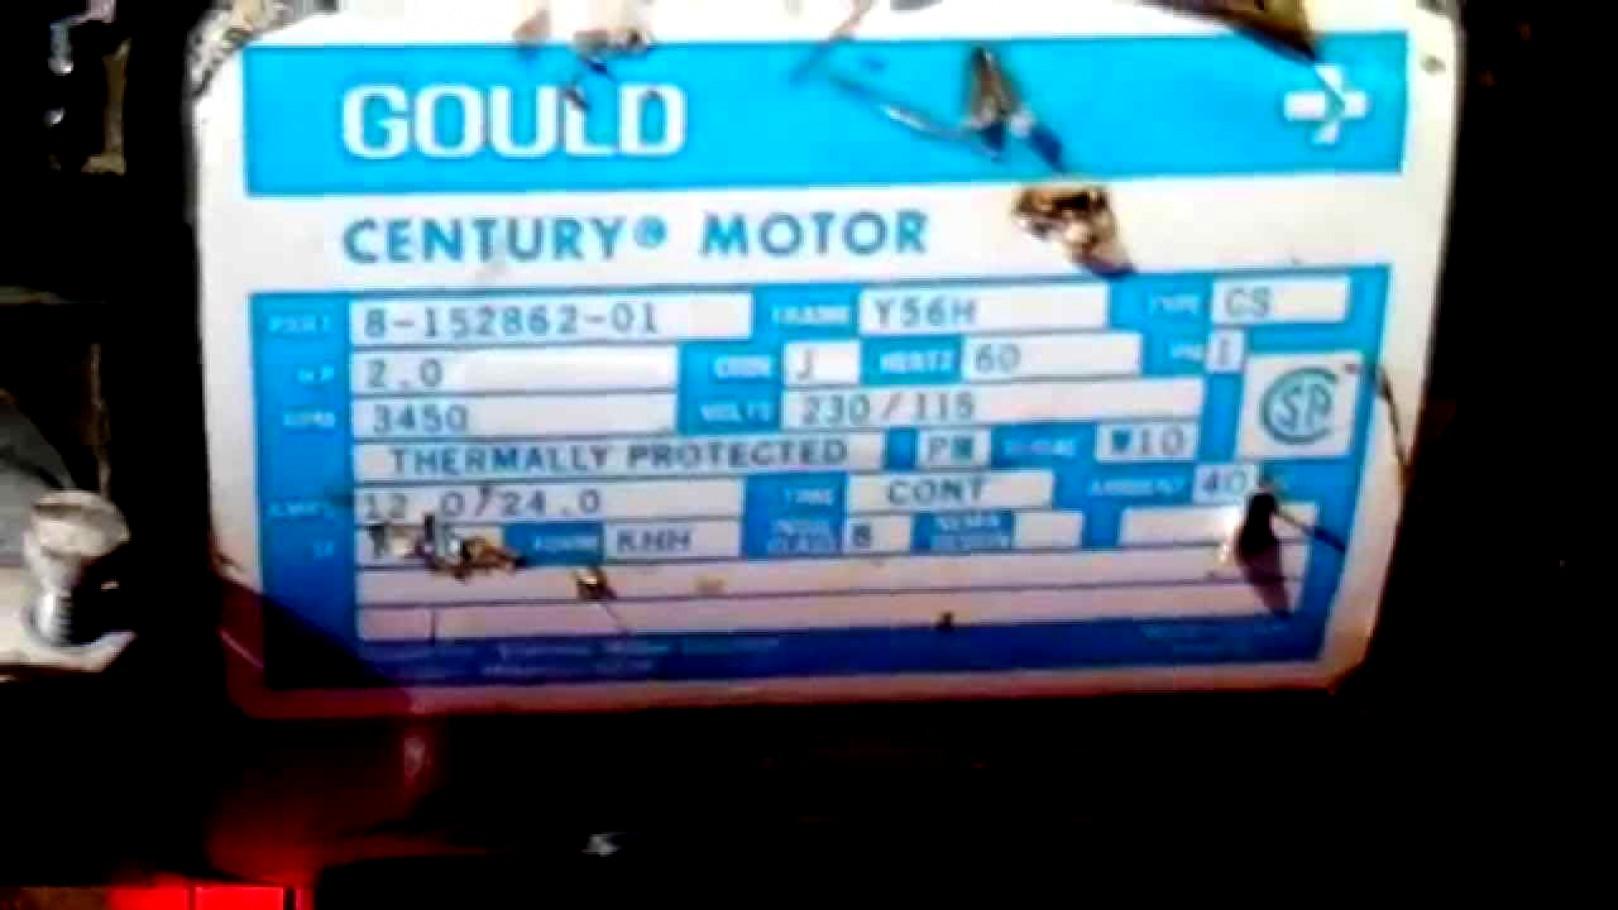 Century Motors Wiring Digram | Wiring Diagram - Gould Century Motor Wiring Diagram